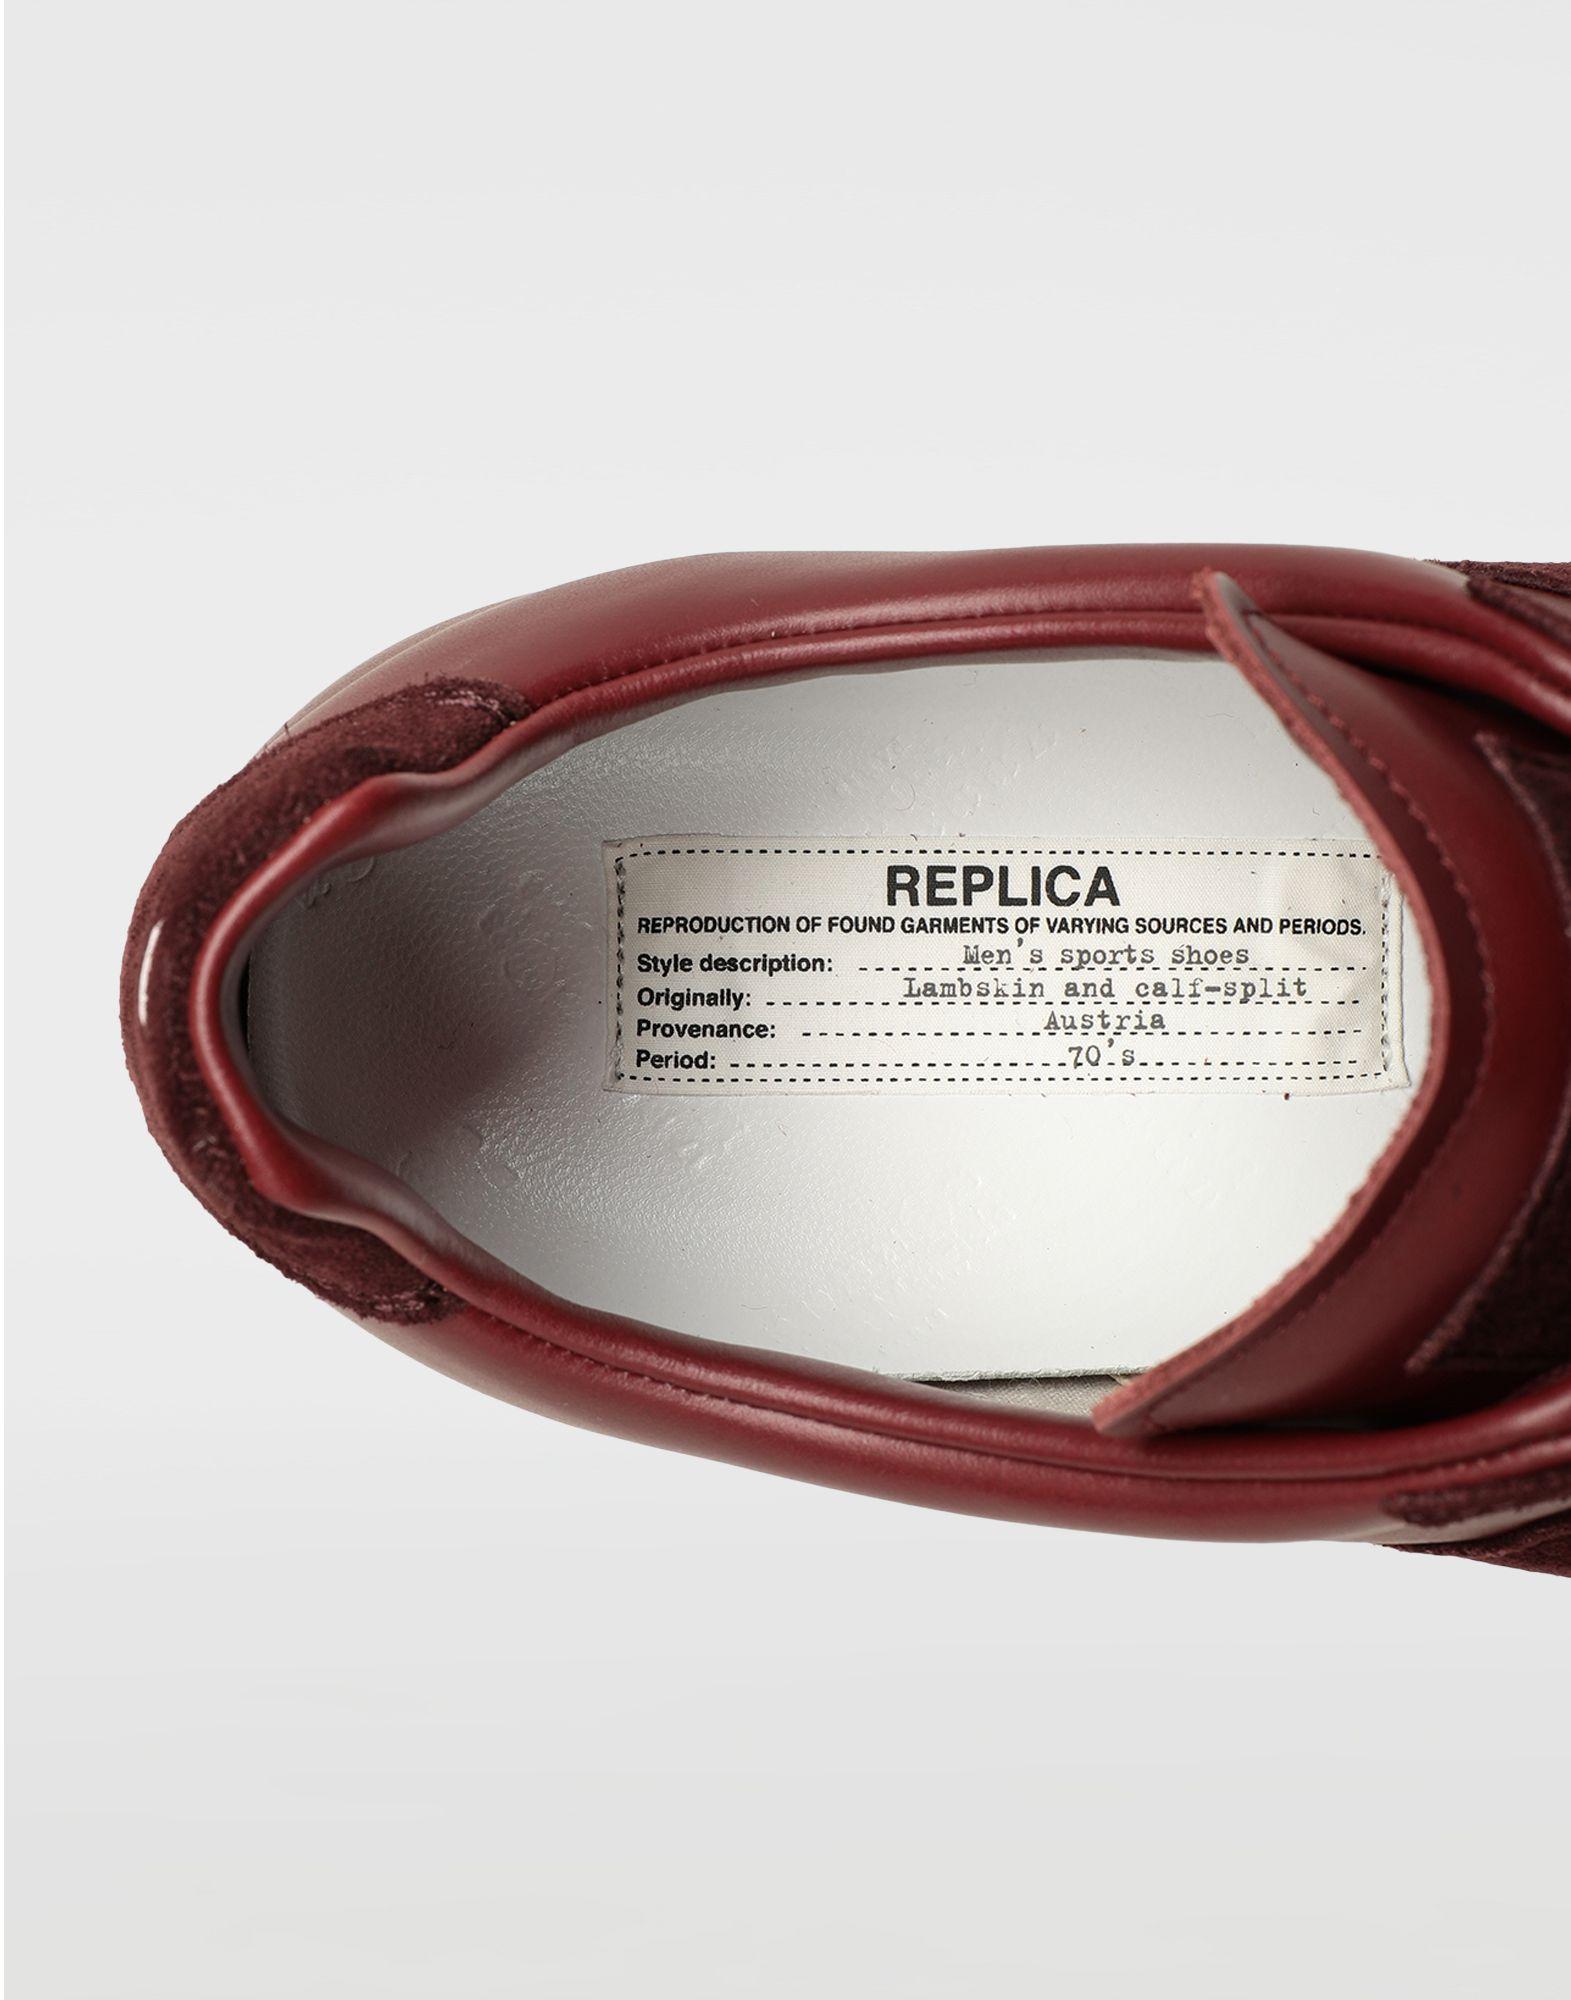 MAISON MARGIELA Replica low top sneakers Sneakers Man a